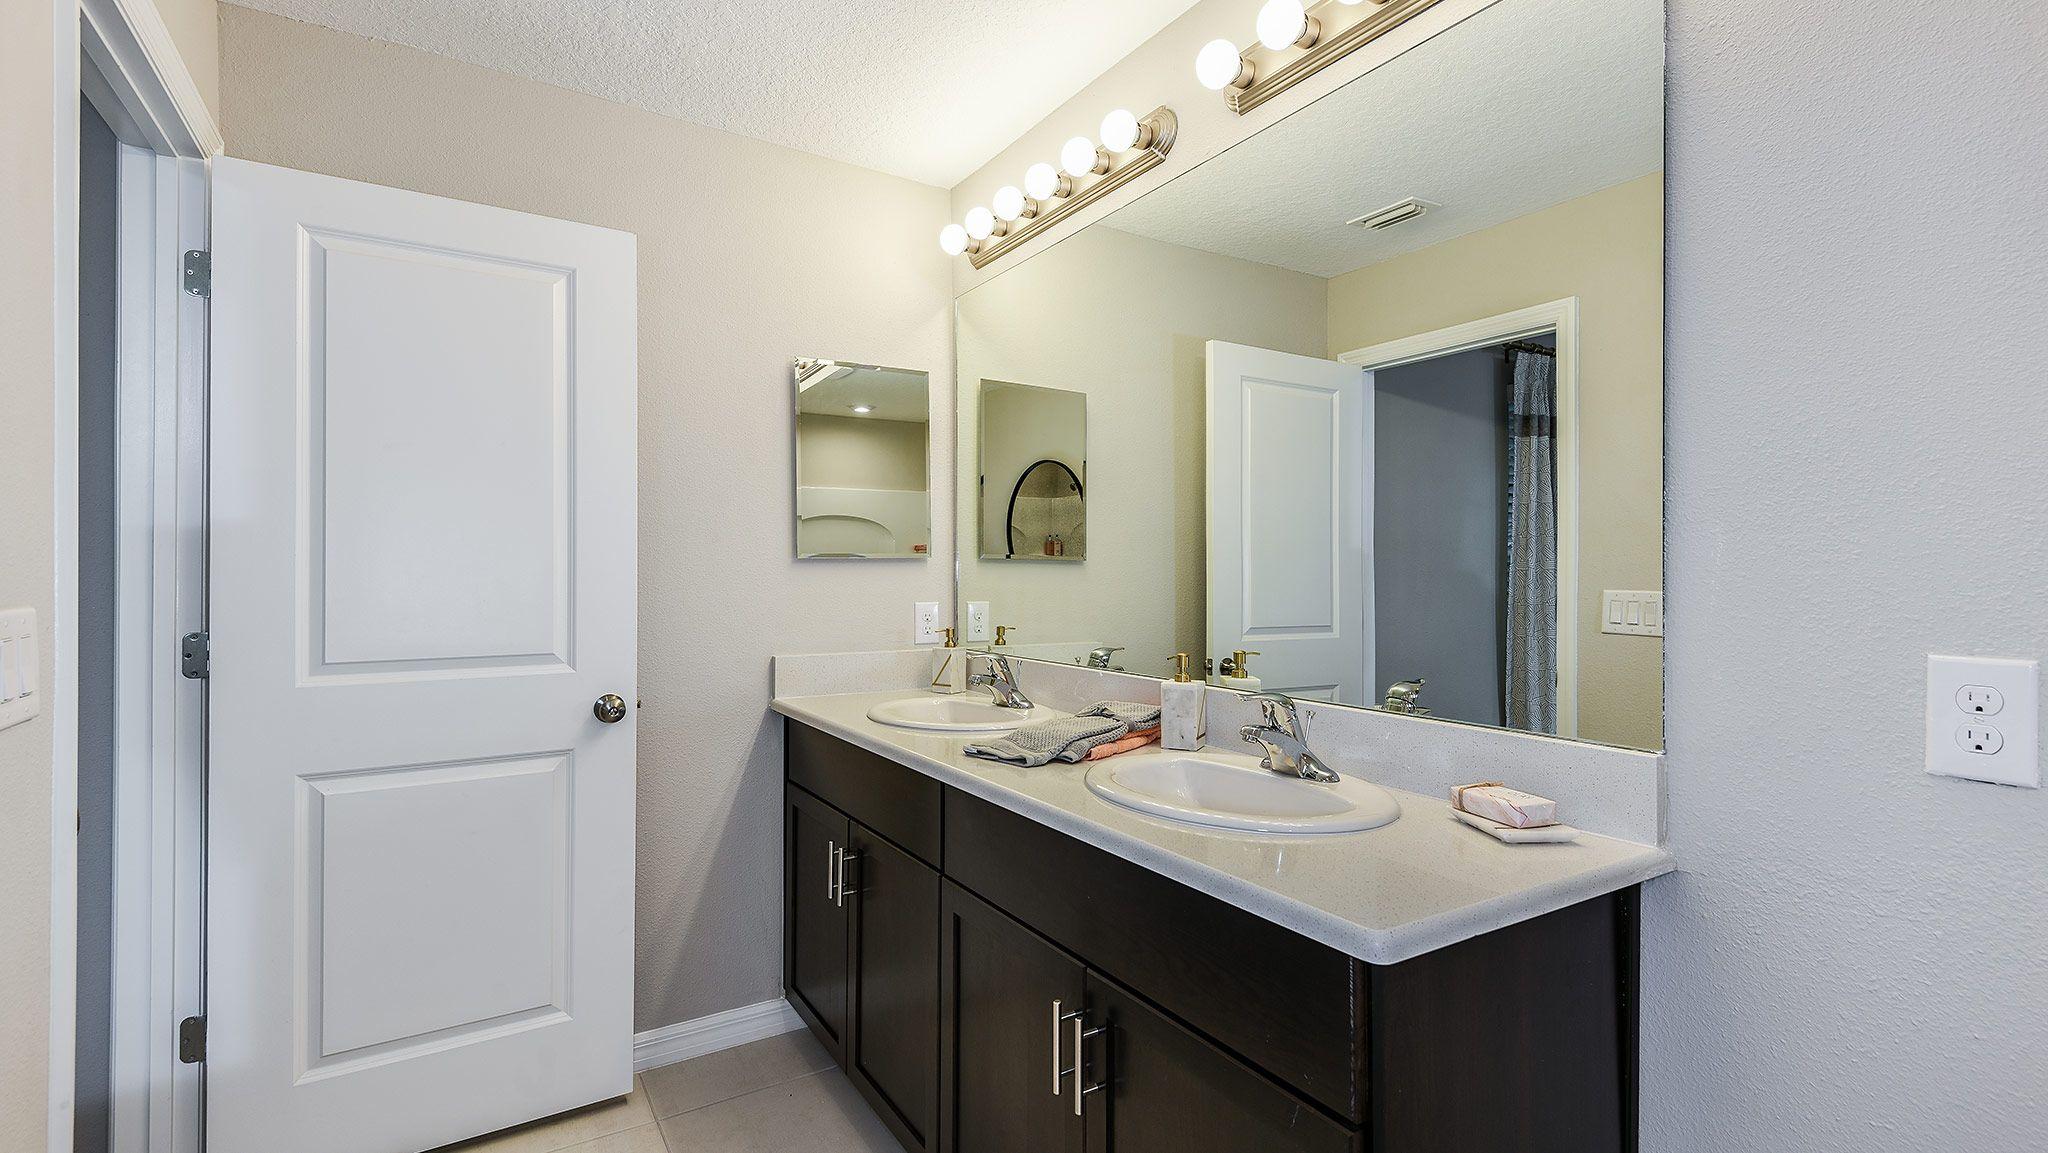 Bathroom featured in the Marigold By Taylor Morrison in Sarasota-Bradenton, FL